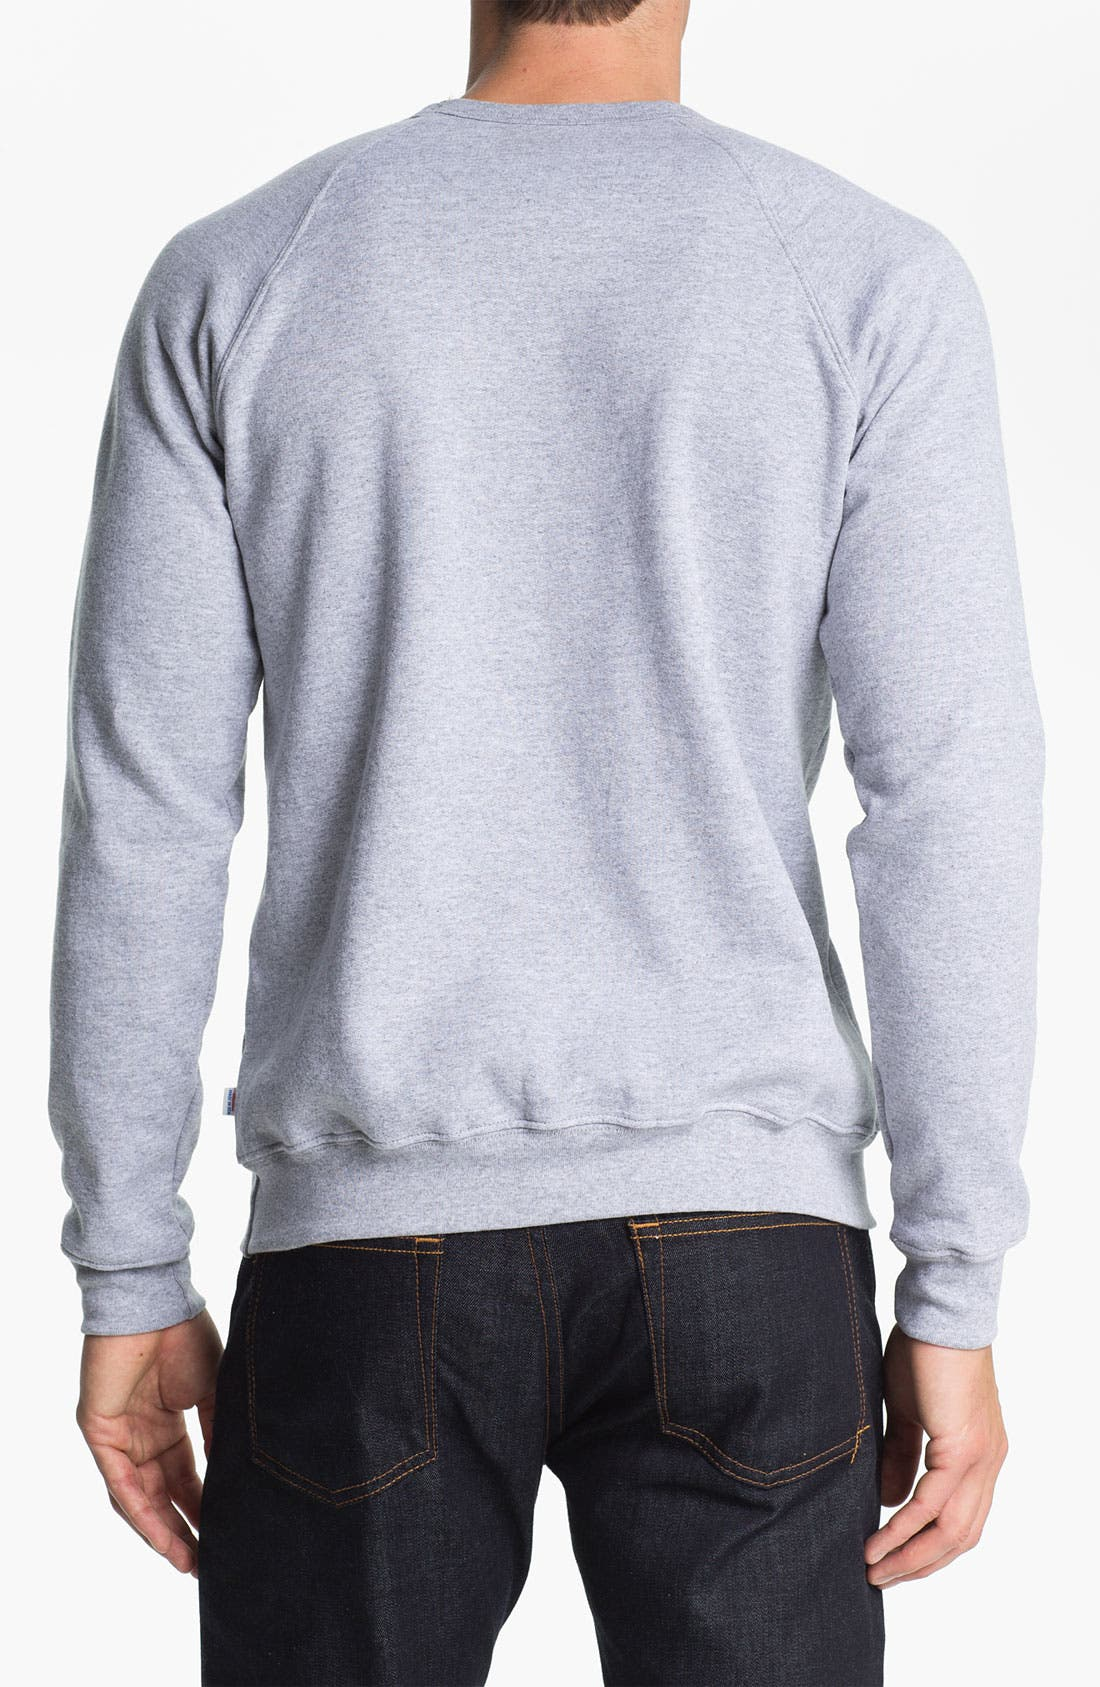 Alternate Image 2  - Obey 'All City Champs' Graphic Crewneck Sweatshirt